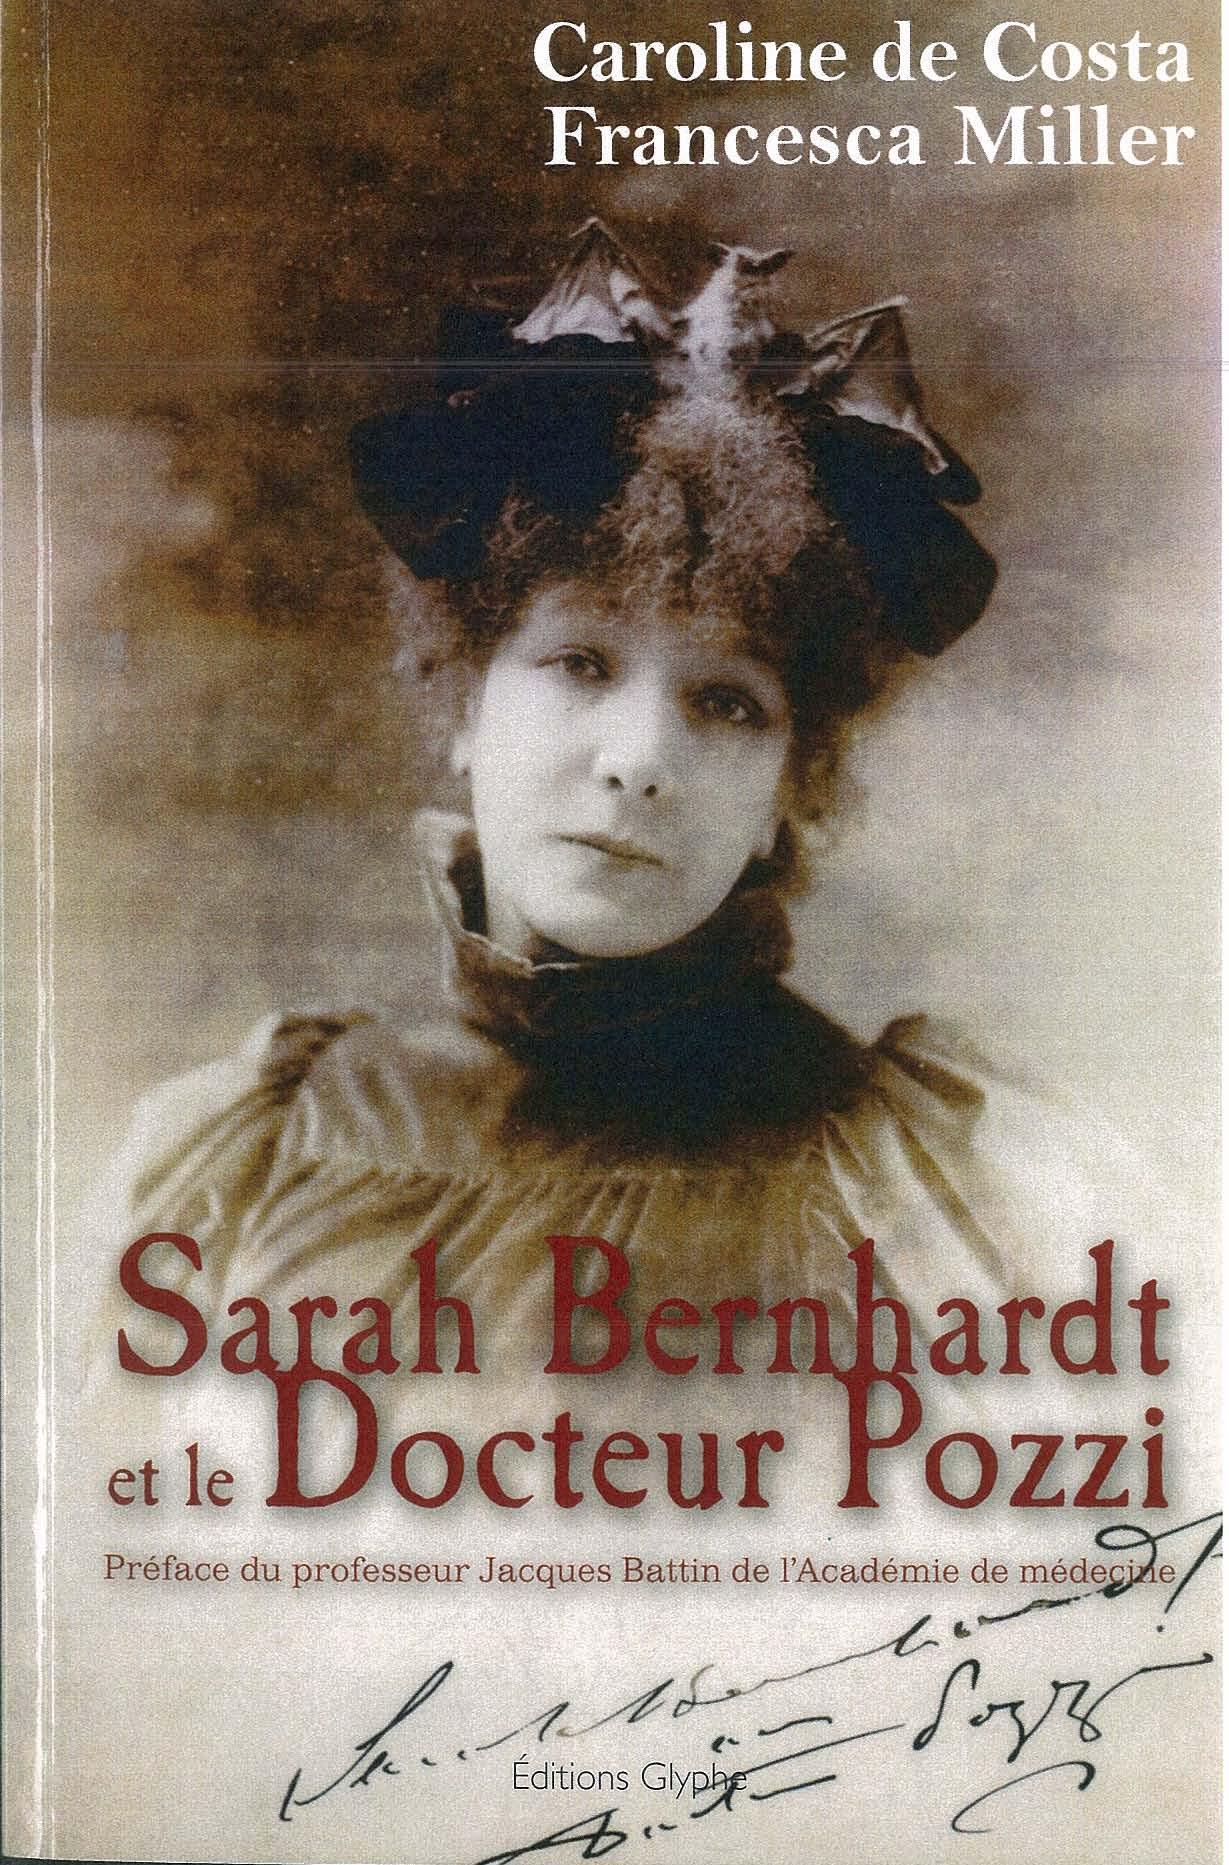 Sarah Bernhardt et le Docteur Pozzi - Caroline de Costa,Francesca Miller